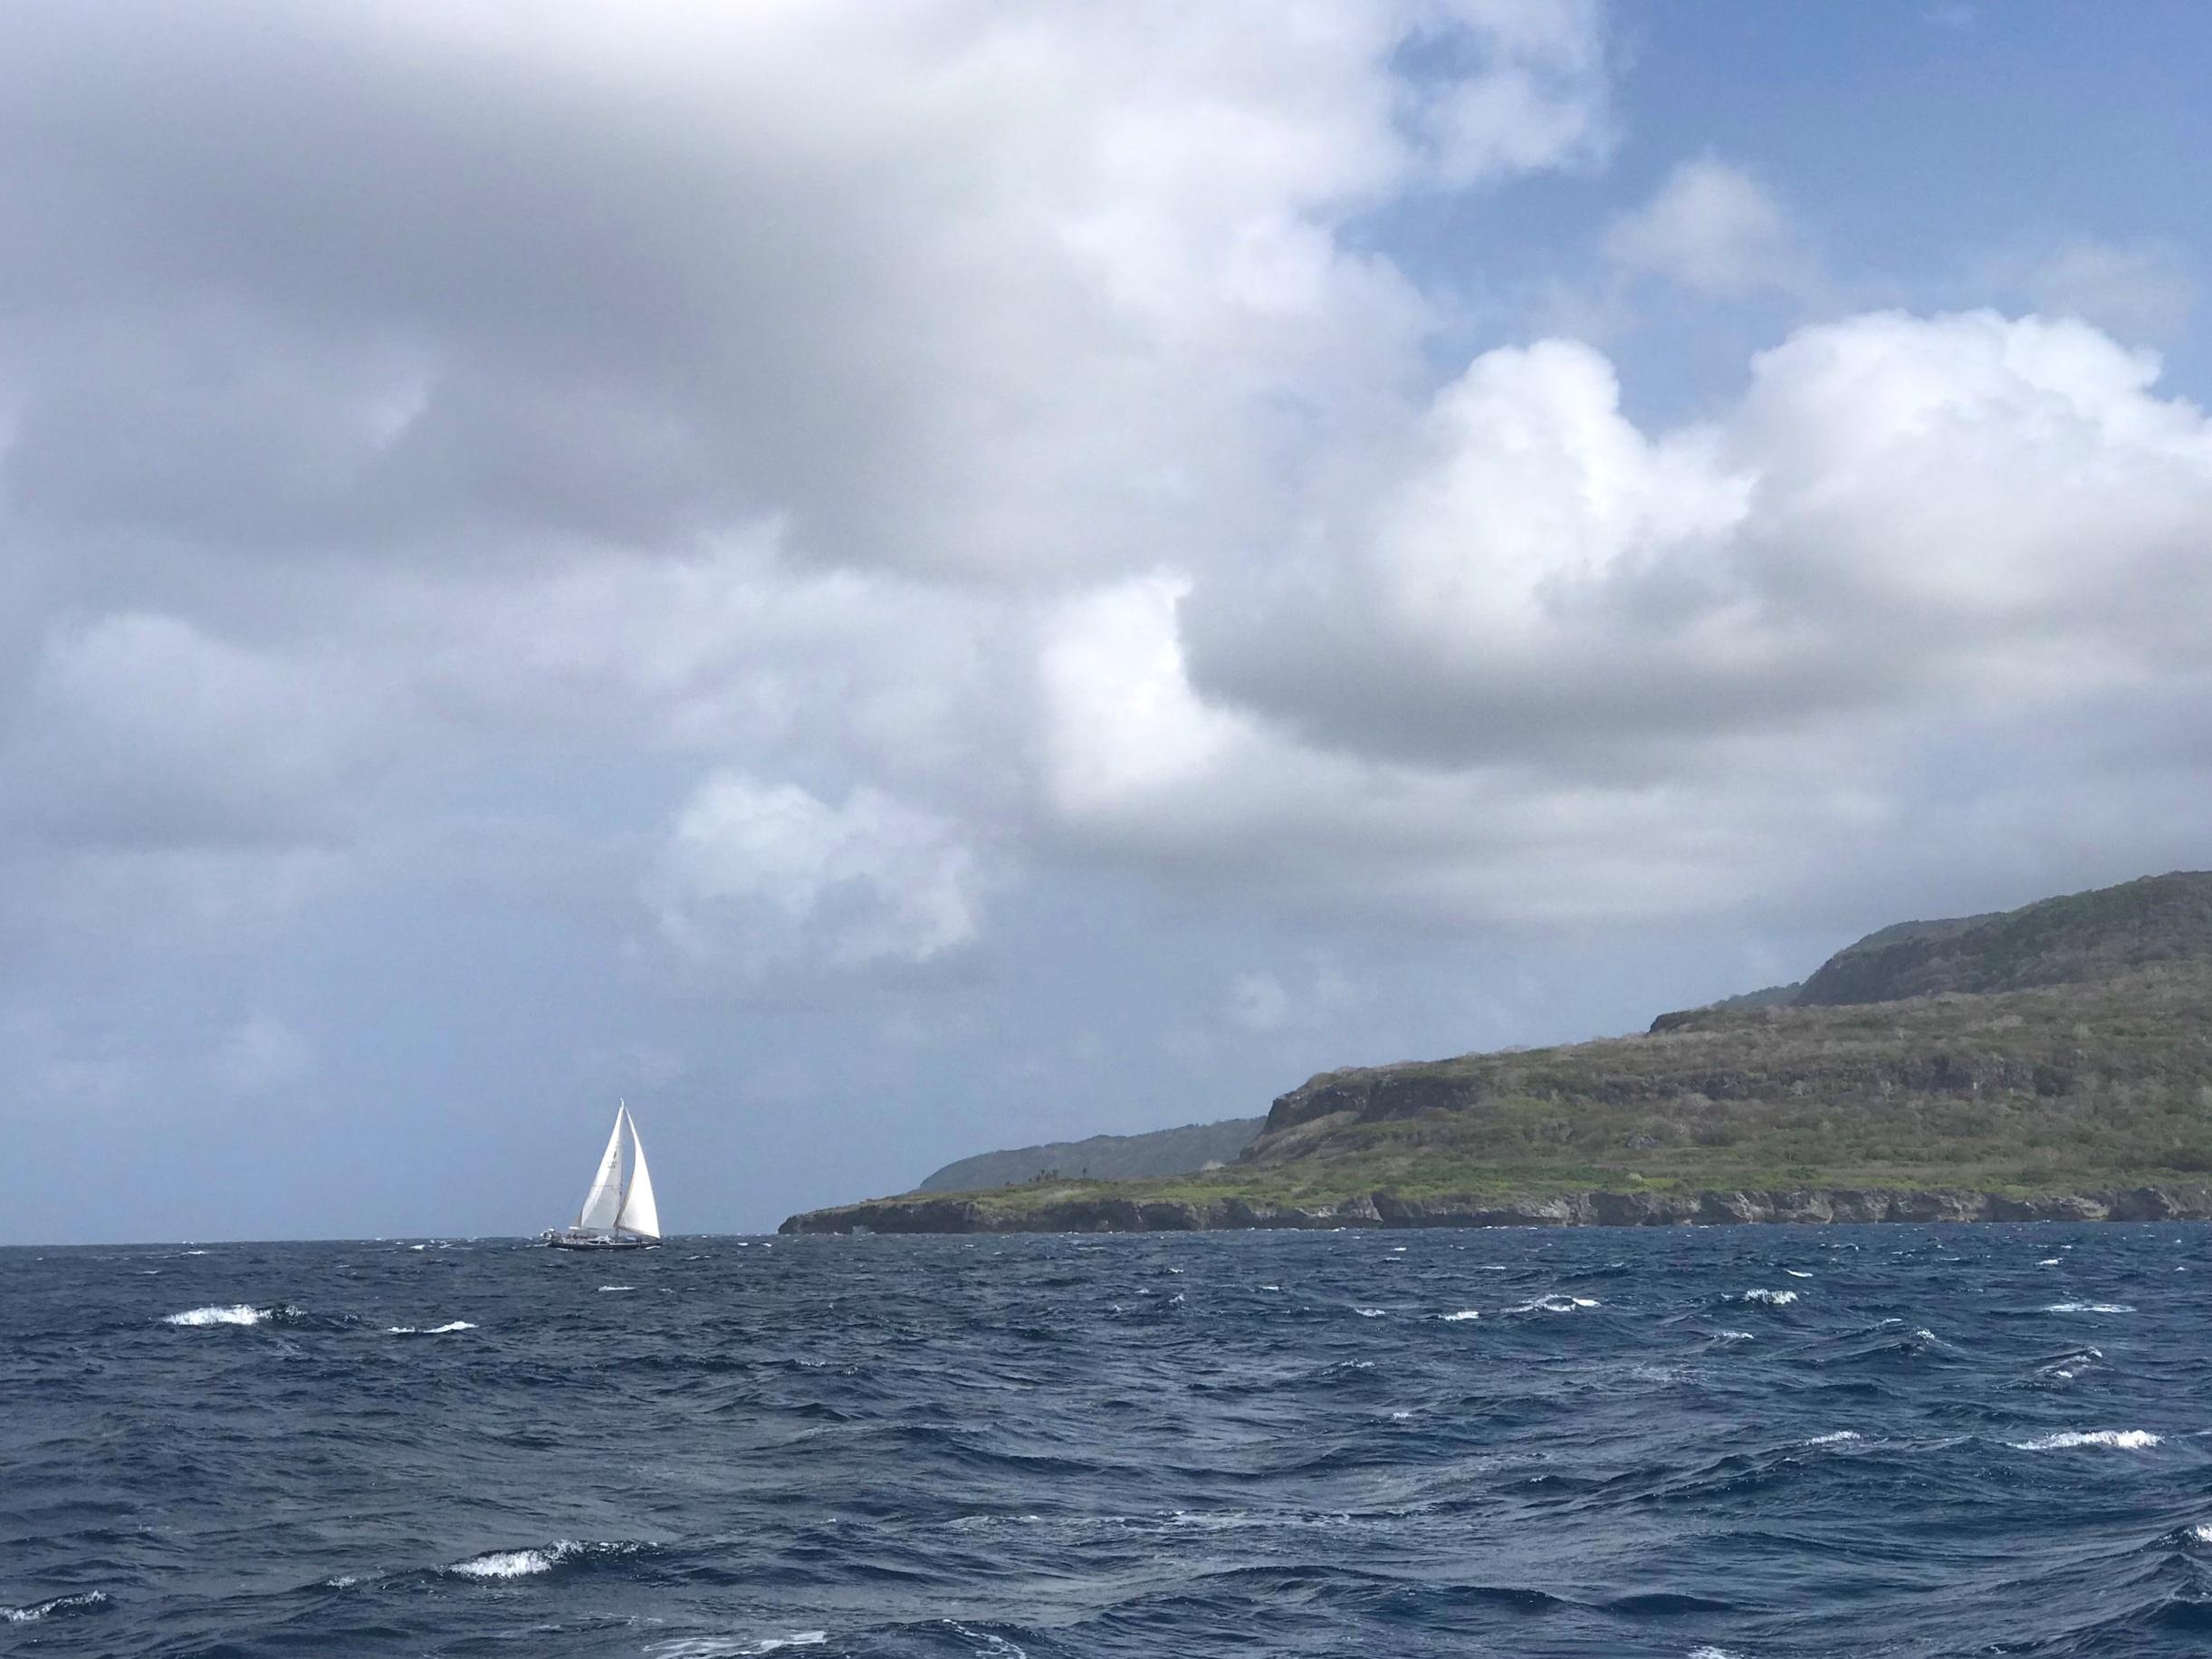 Aurora Polaris heading into Christmas Island